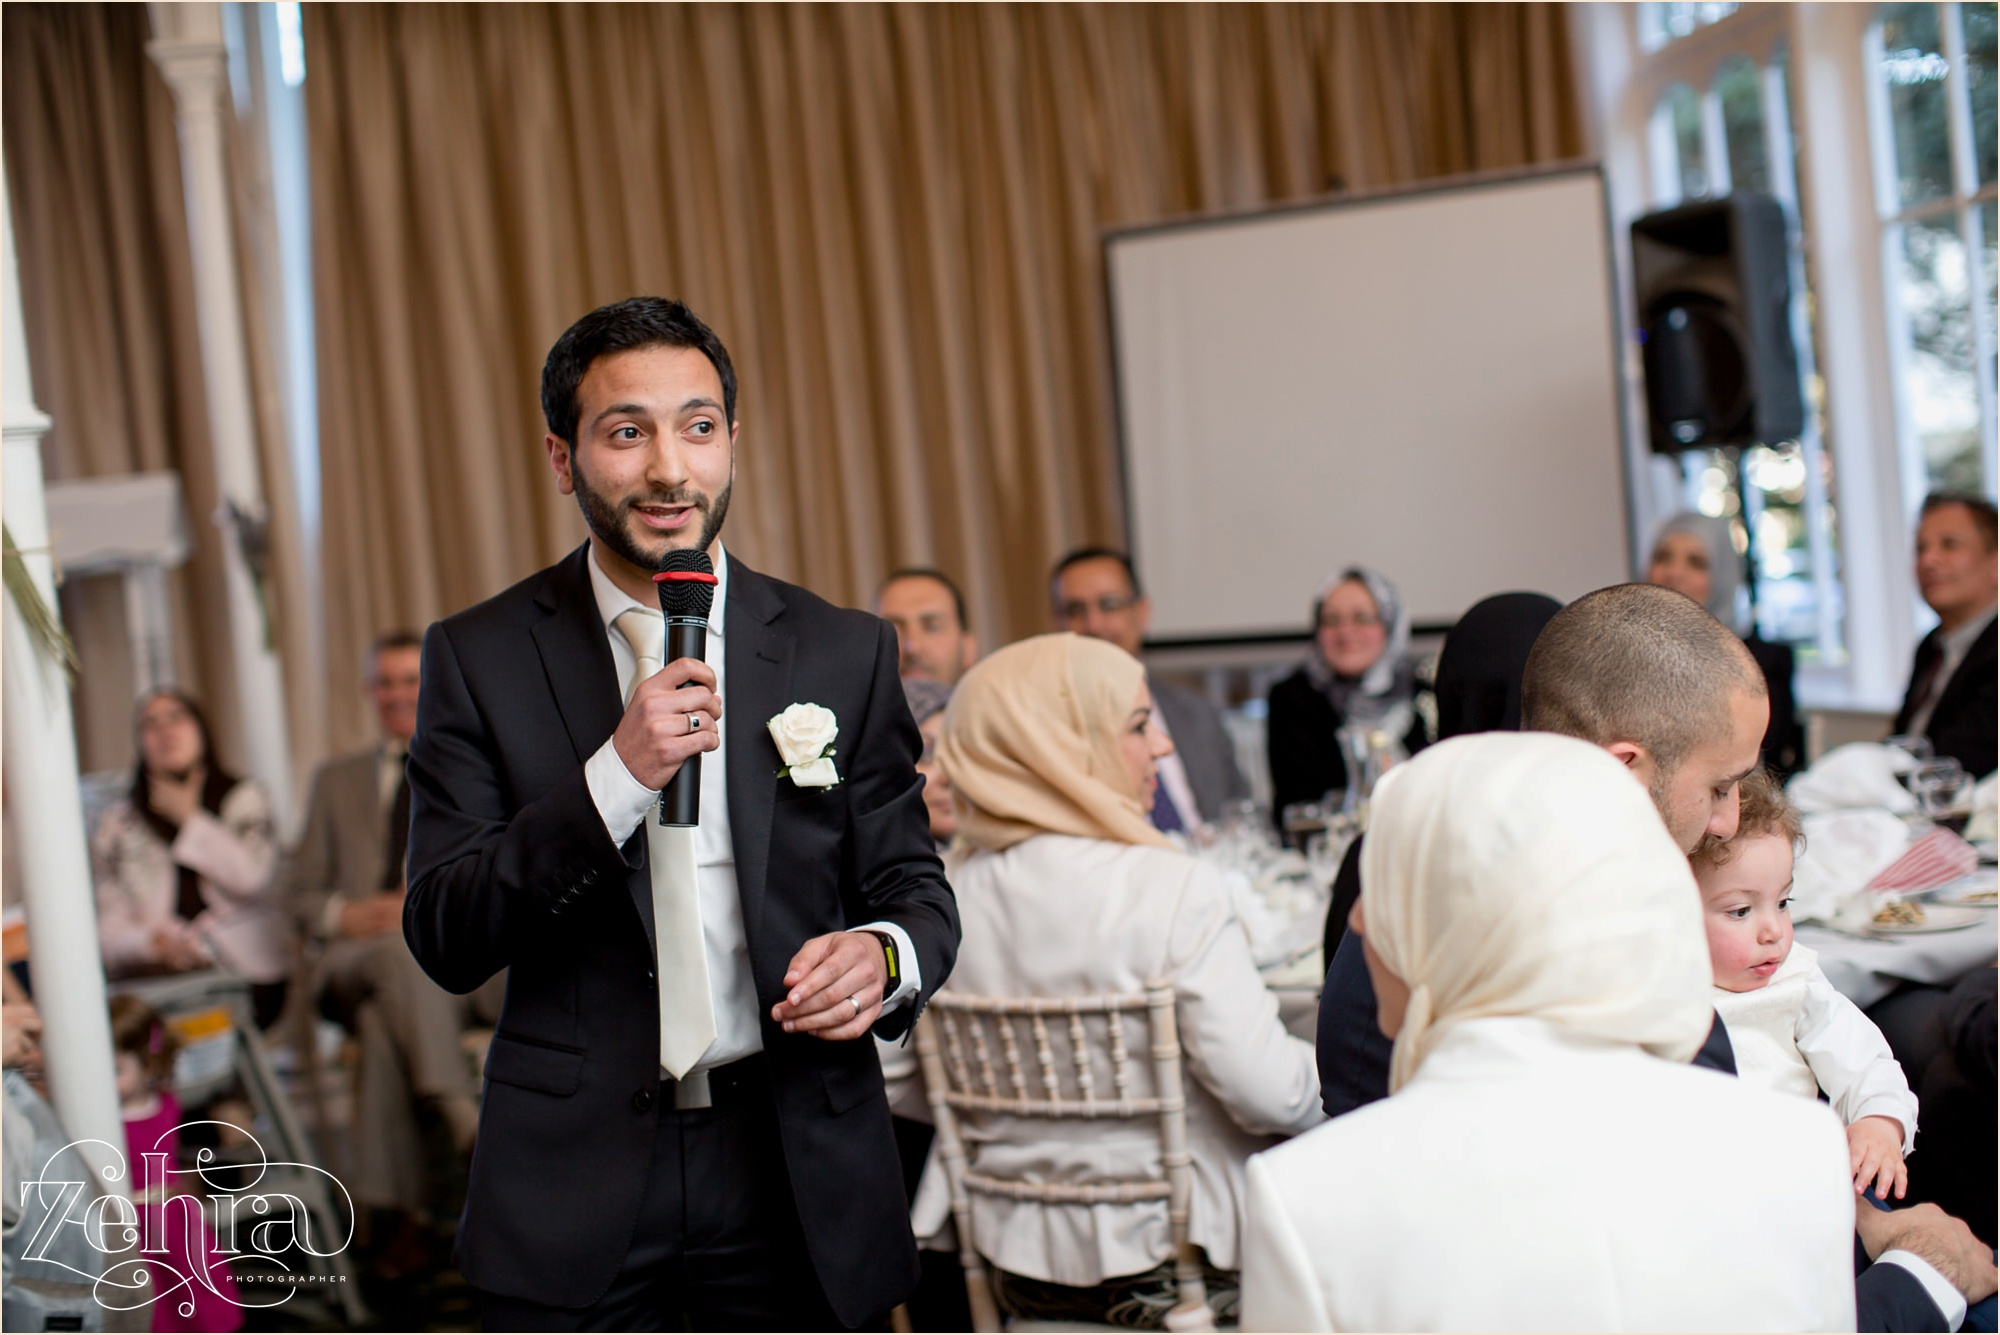 jasira manchester wedding photographer_0104.jpg